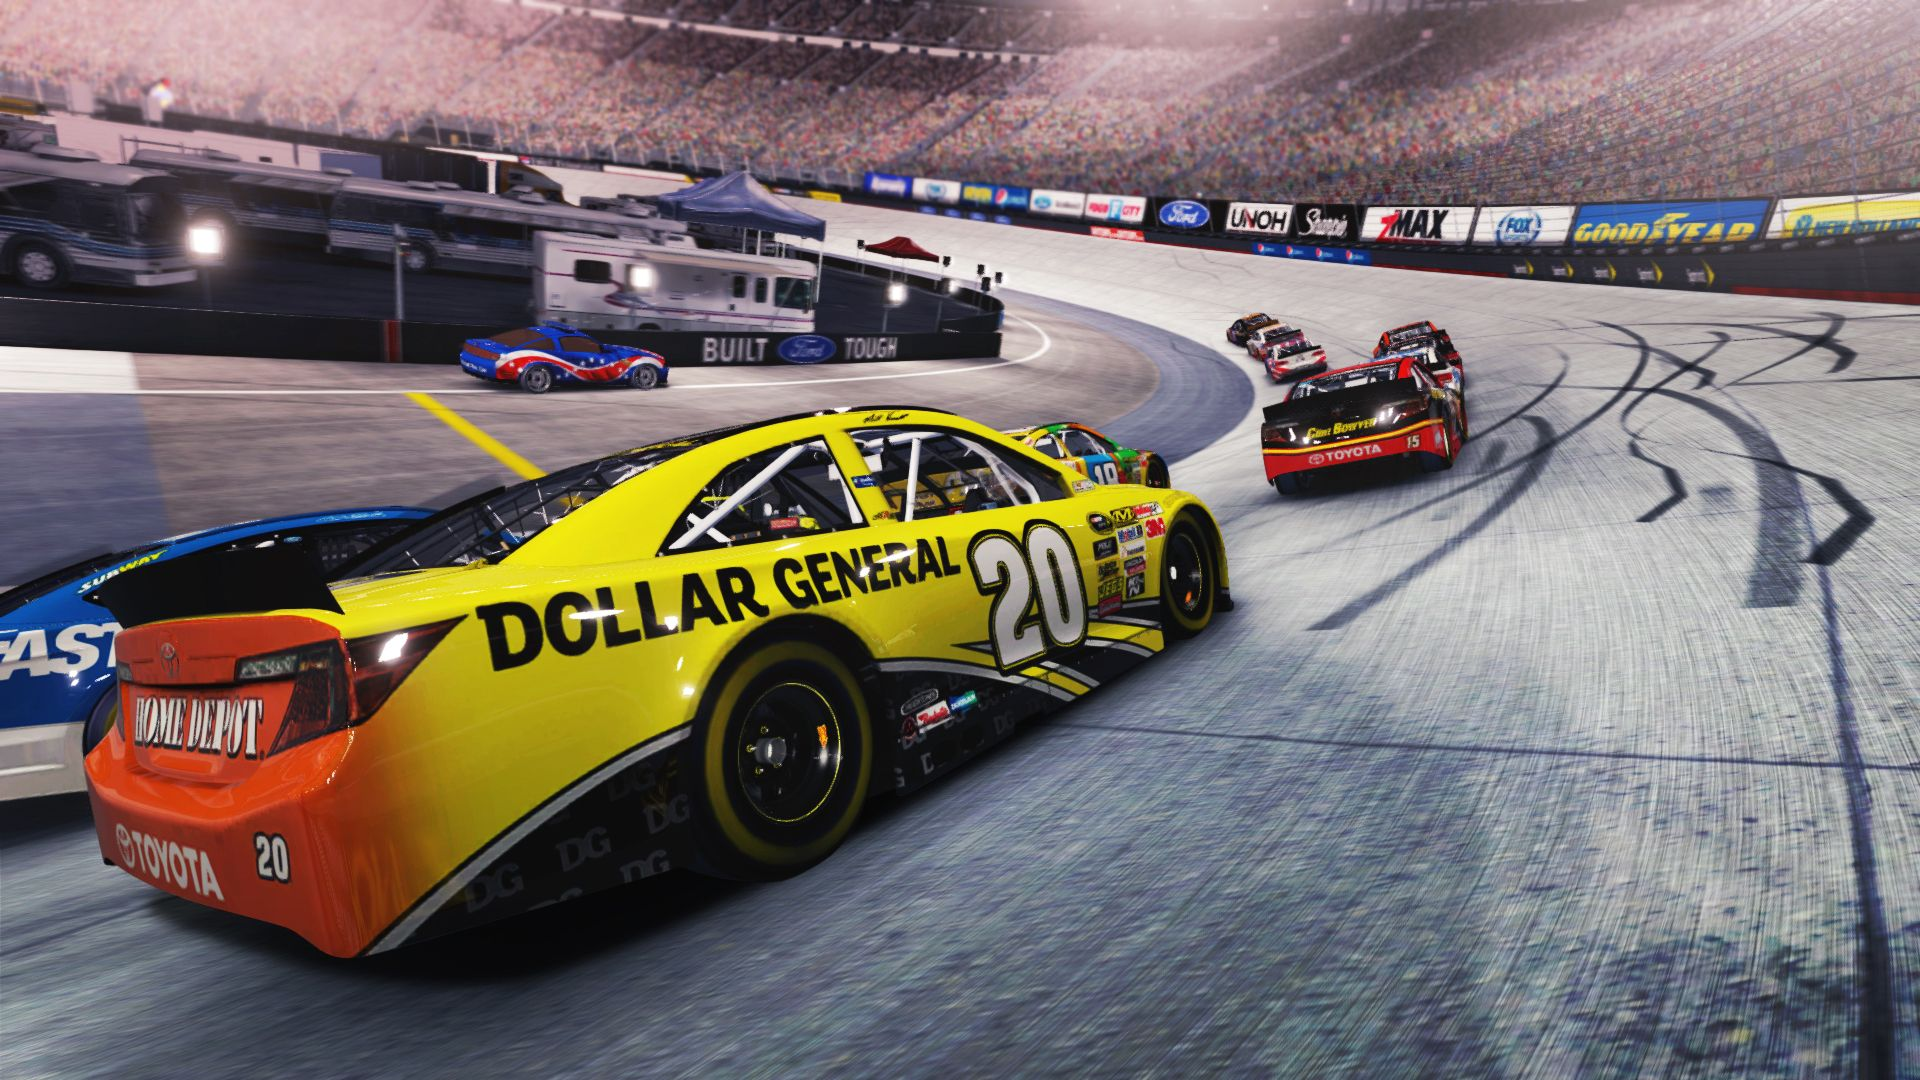 Nascar Live Online NASCAR LIVE STREAMING Watch all